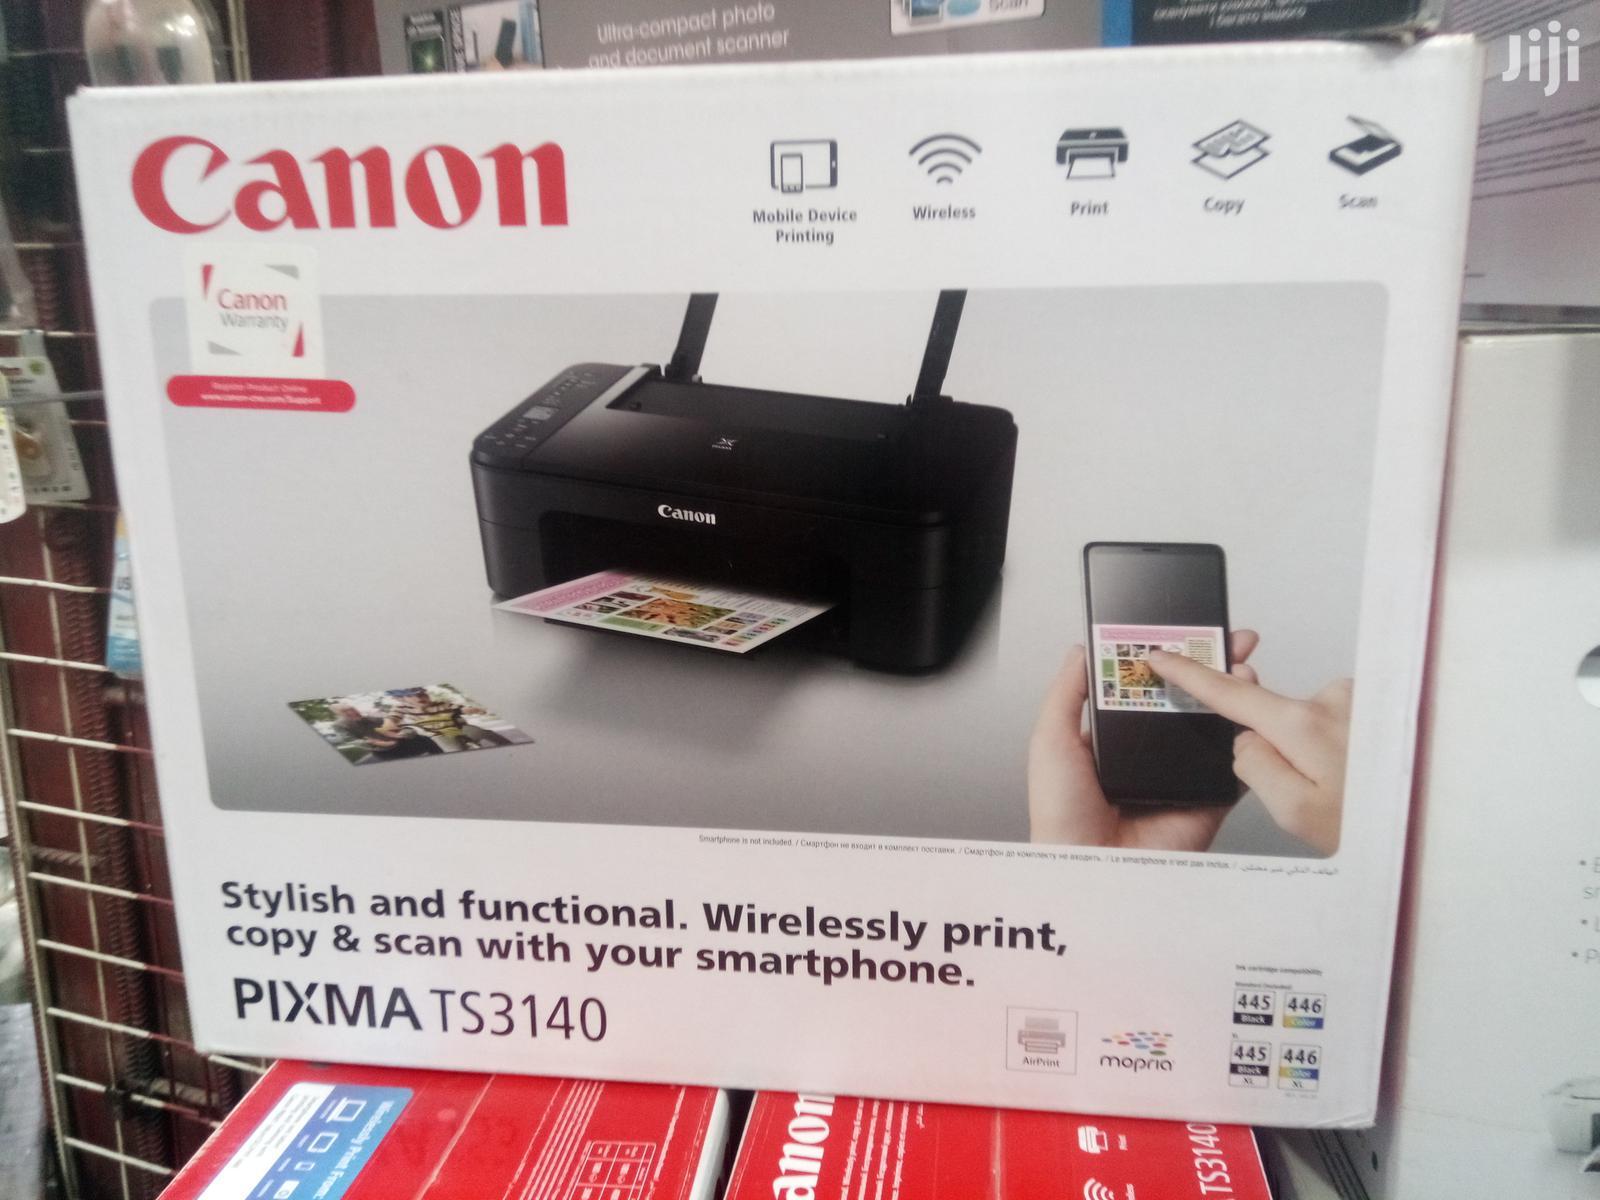 Canon Pixma TS3140 AIO Wireless Printer Print, Scan Copy | Printers & Scanners for sale in Alimosho, Lagos State, Nigeria